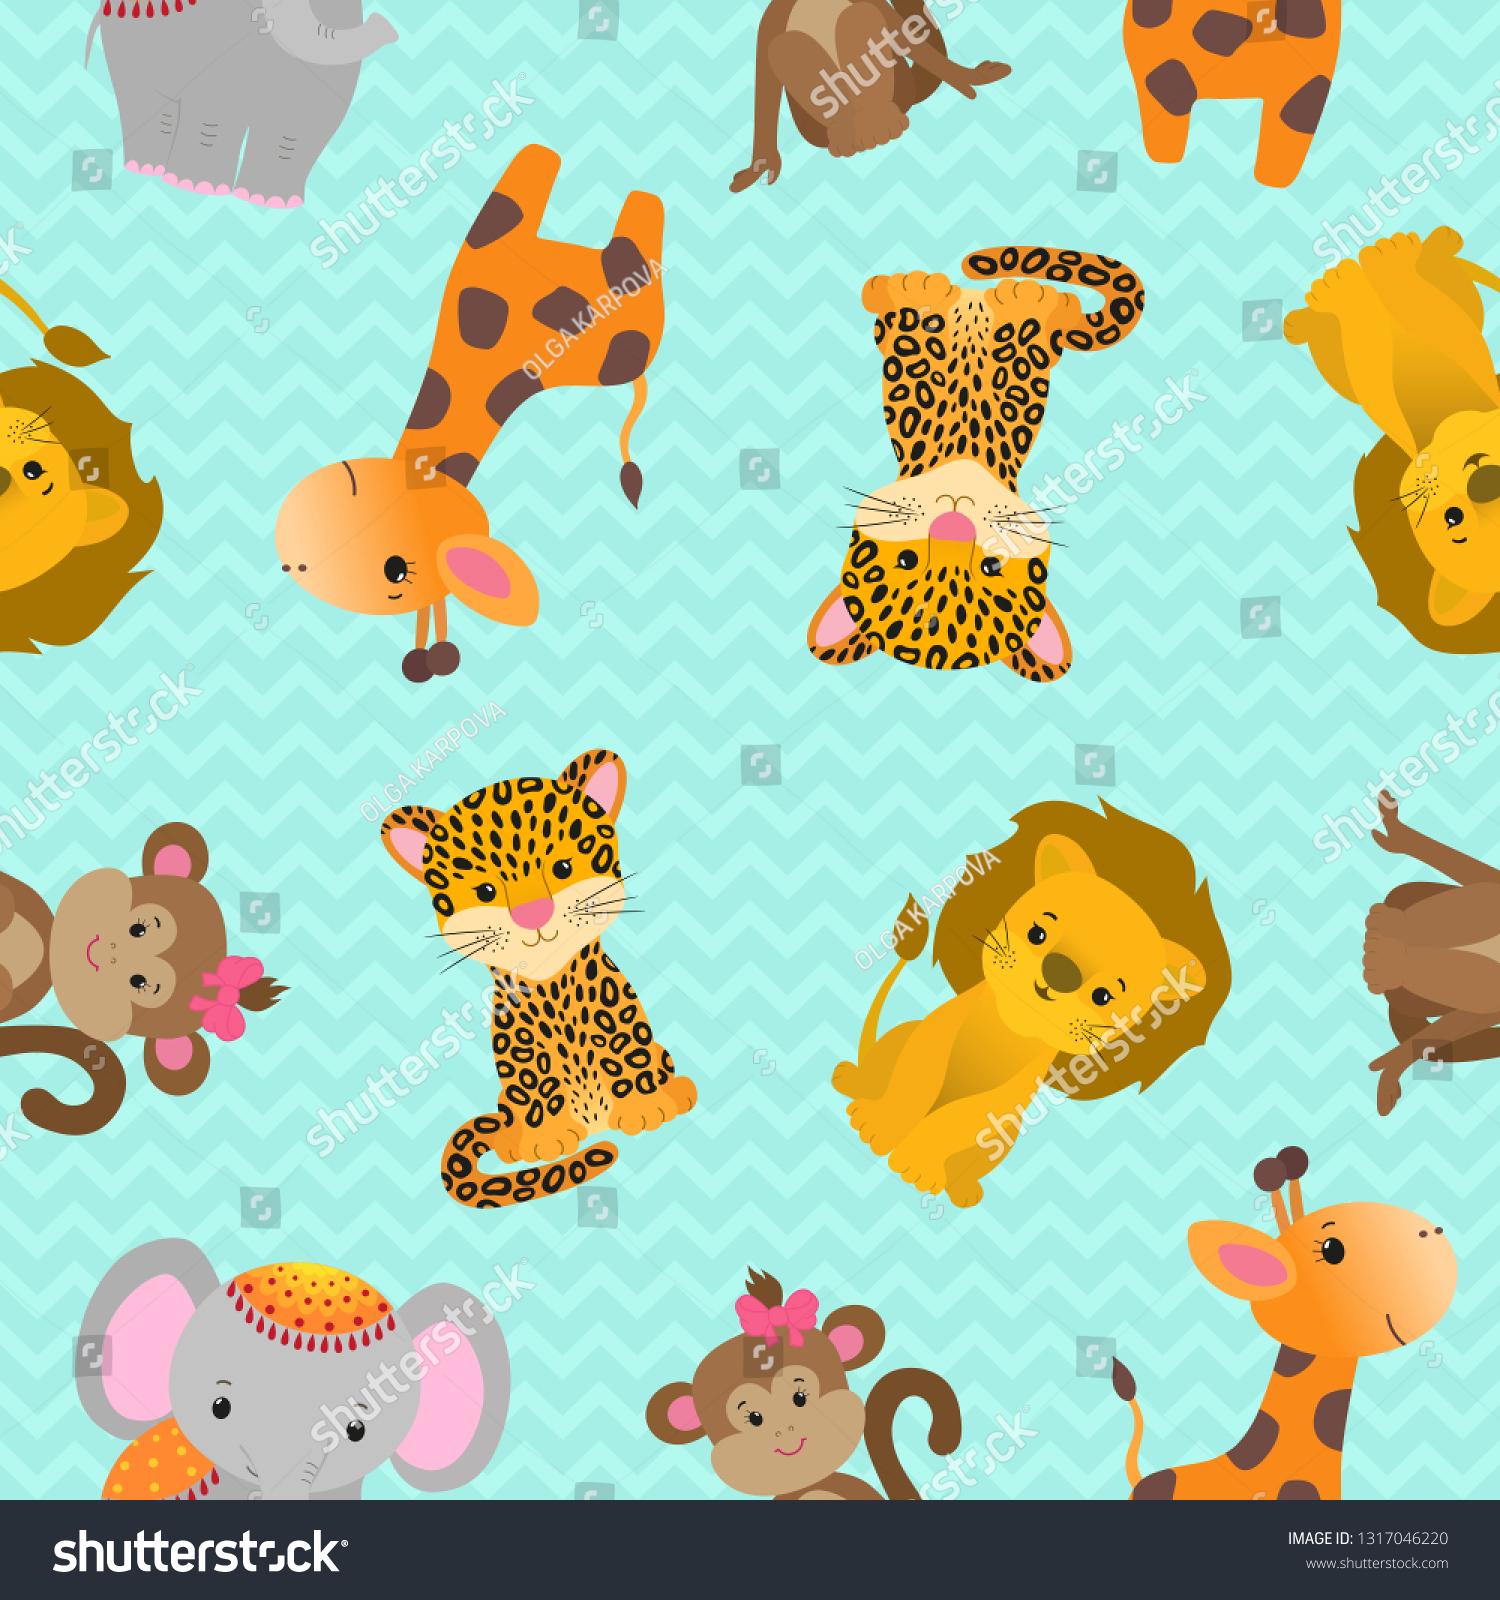 Animated Cheetah Wallpaper funny animals pattern seamless design cartoon stock vector